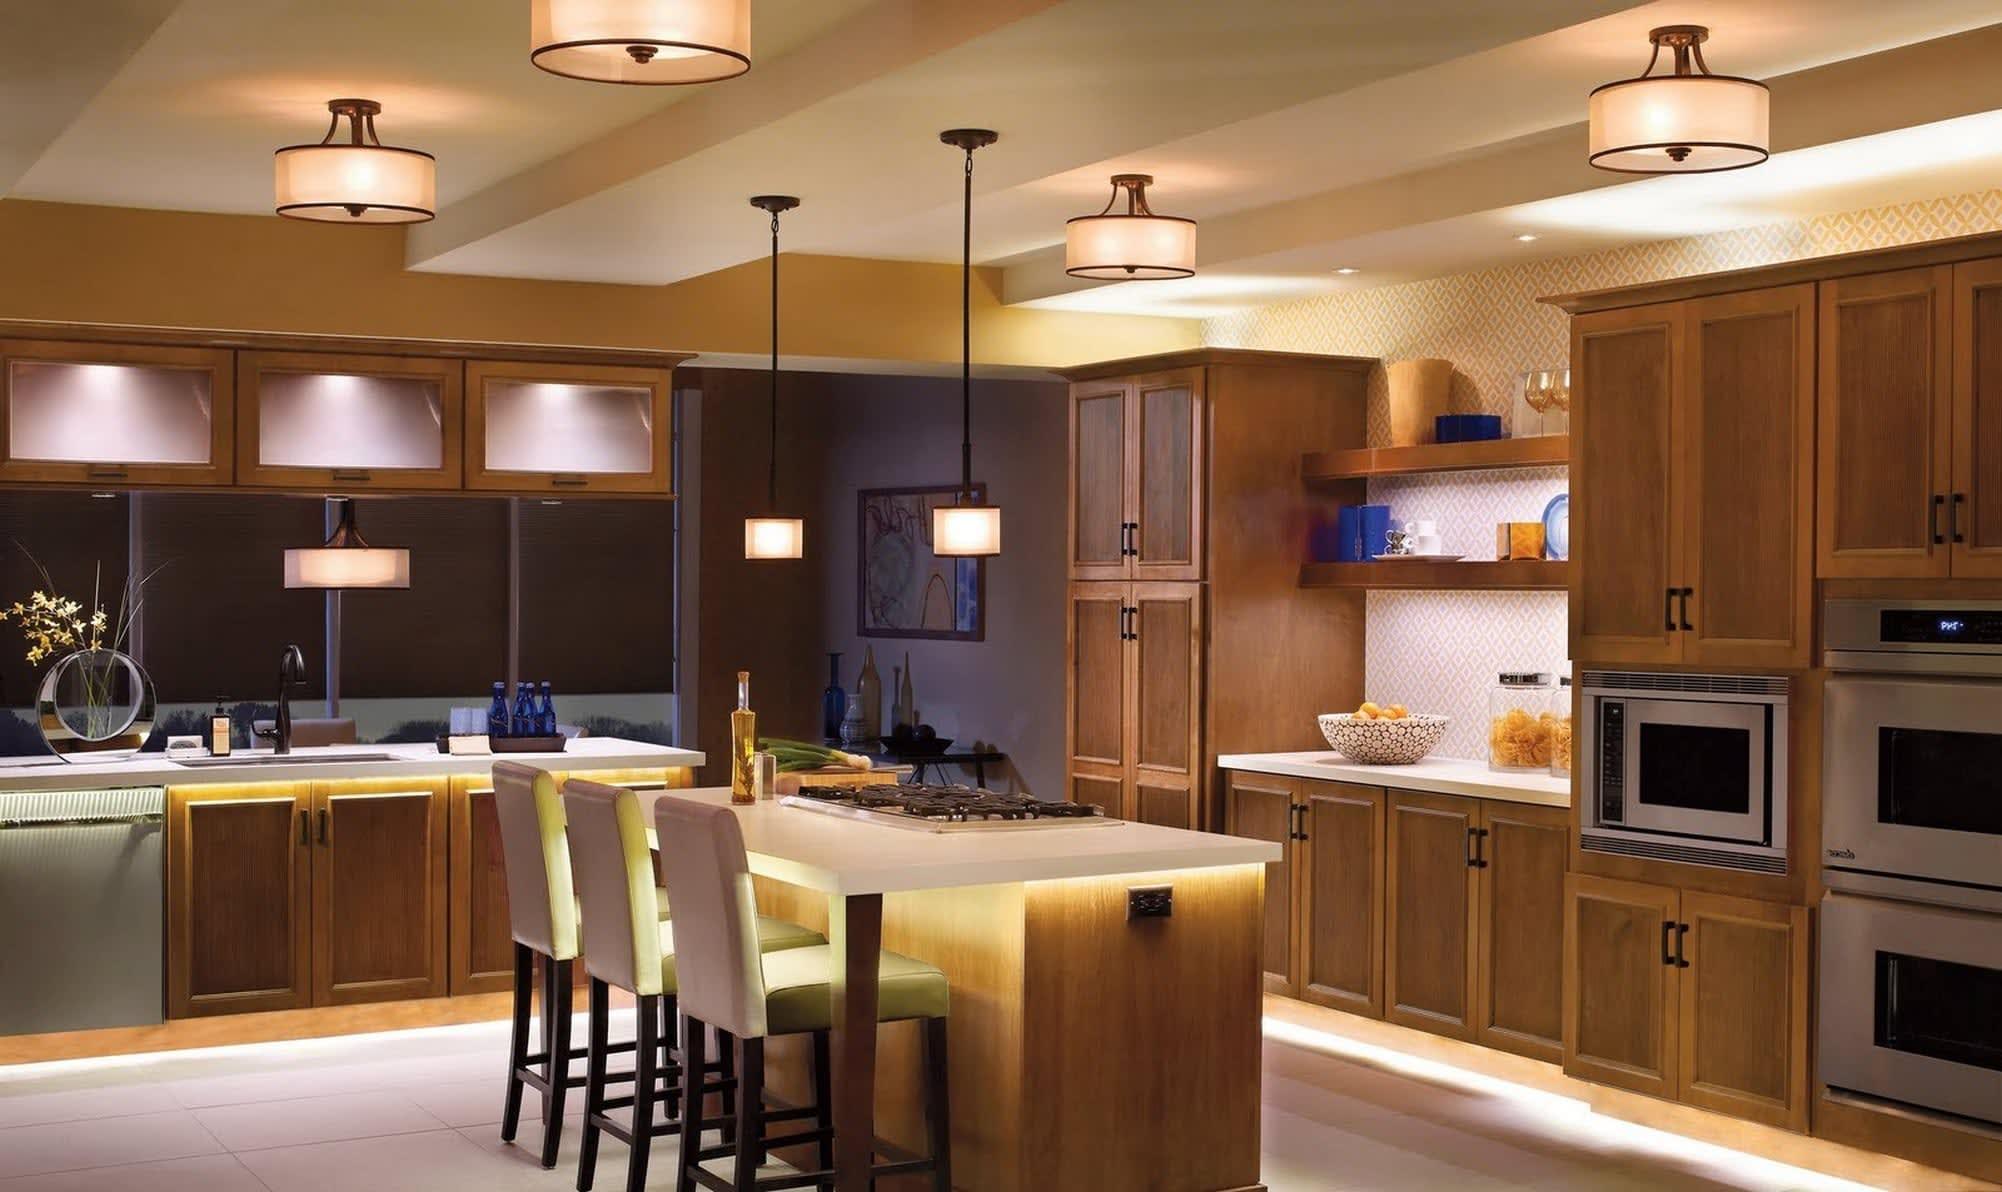 Bringing Kitchen Brightness Into The Light